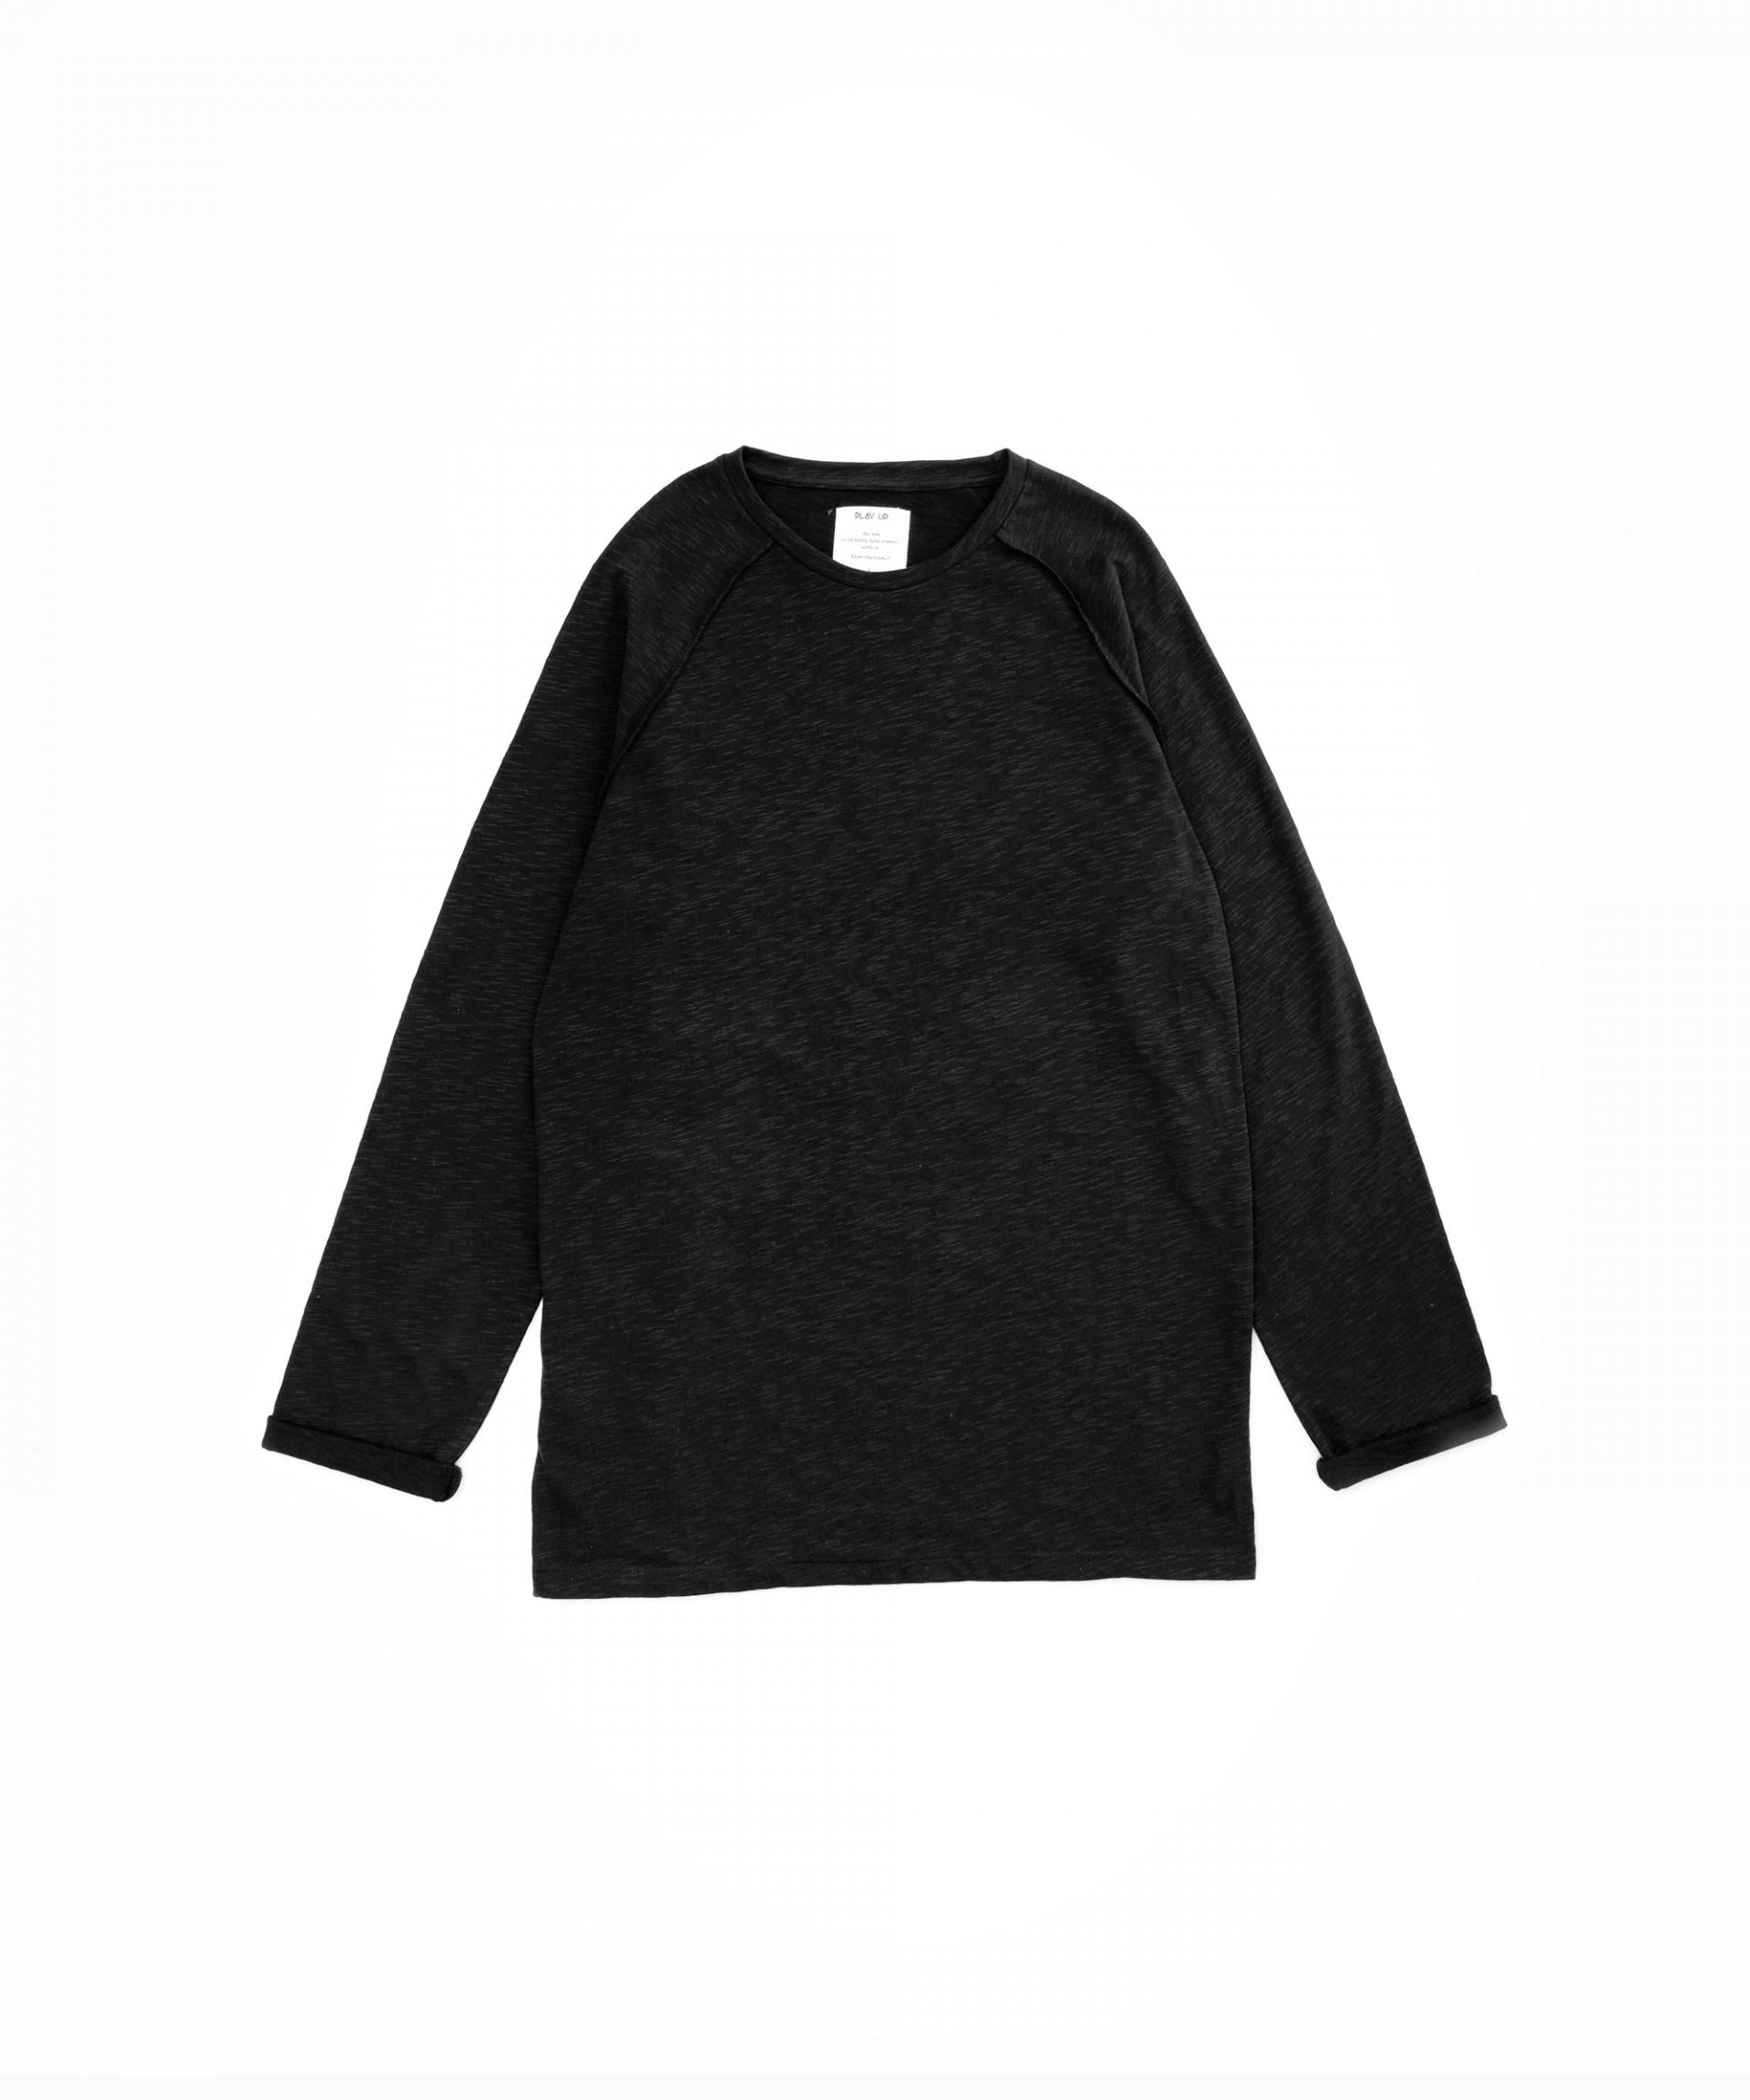 Camiseta de algodón orgánico | Woodwork